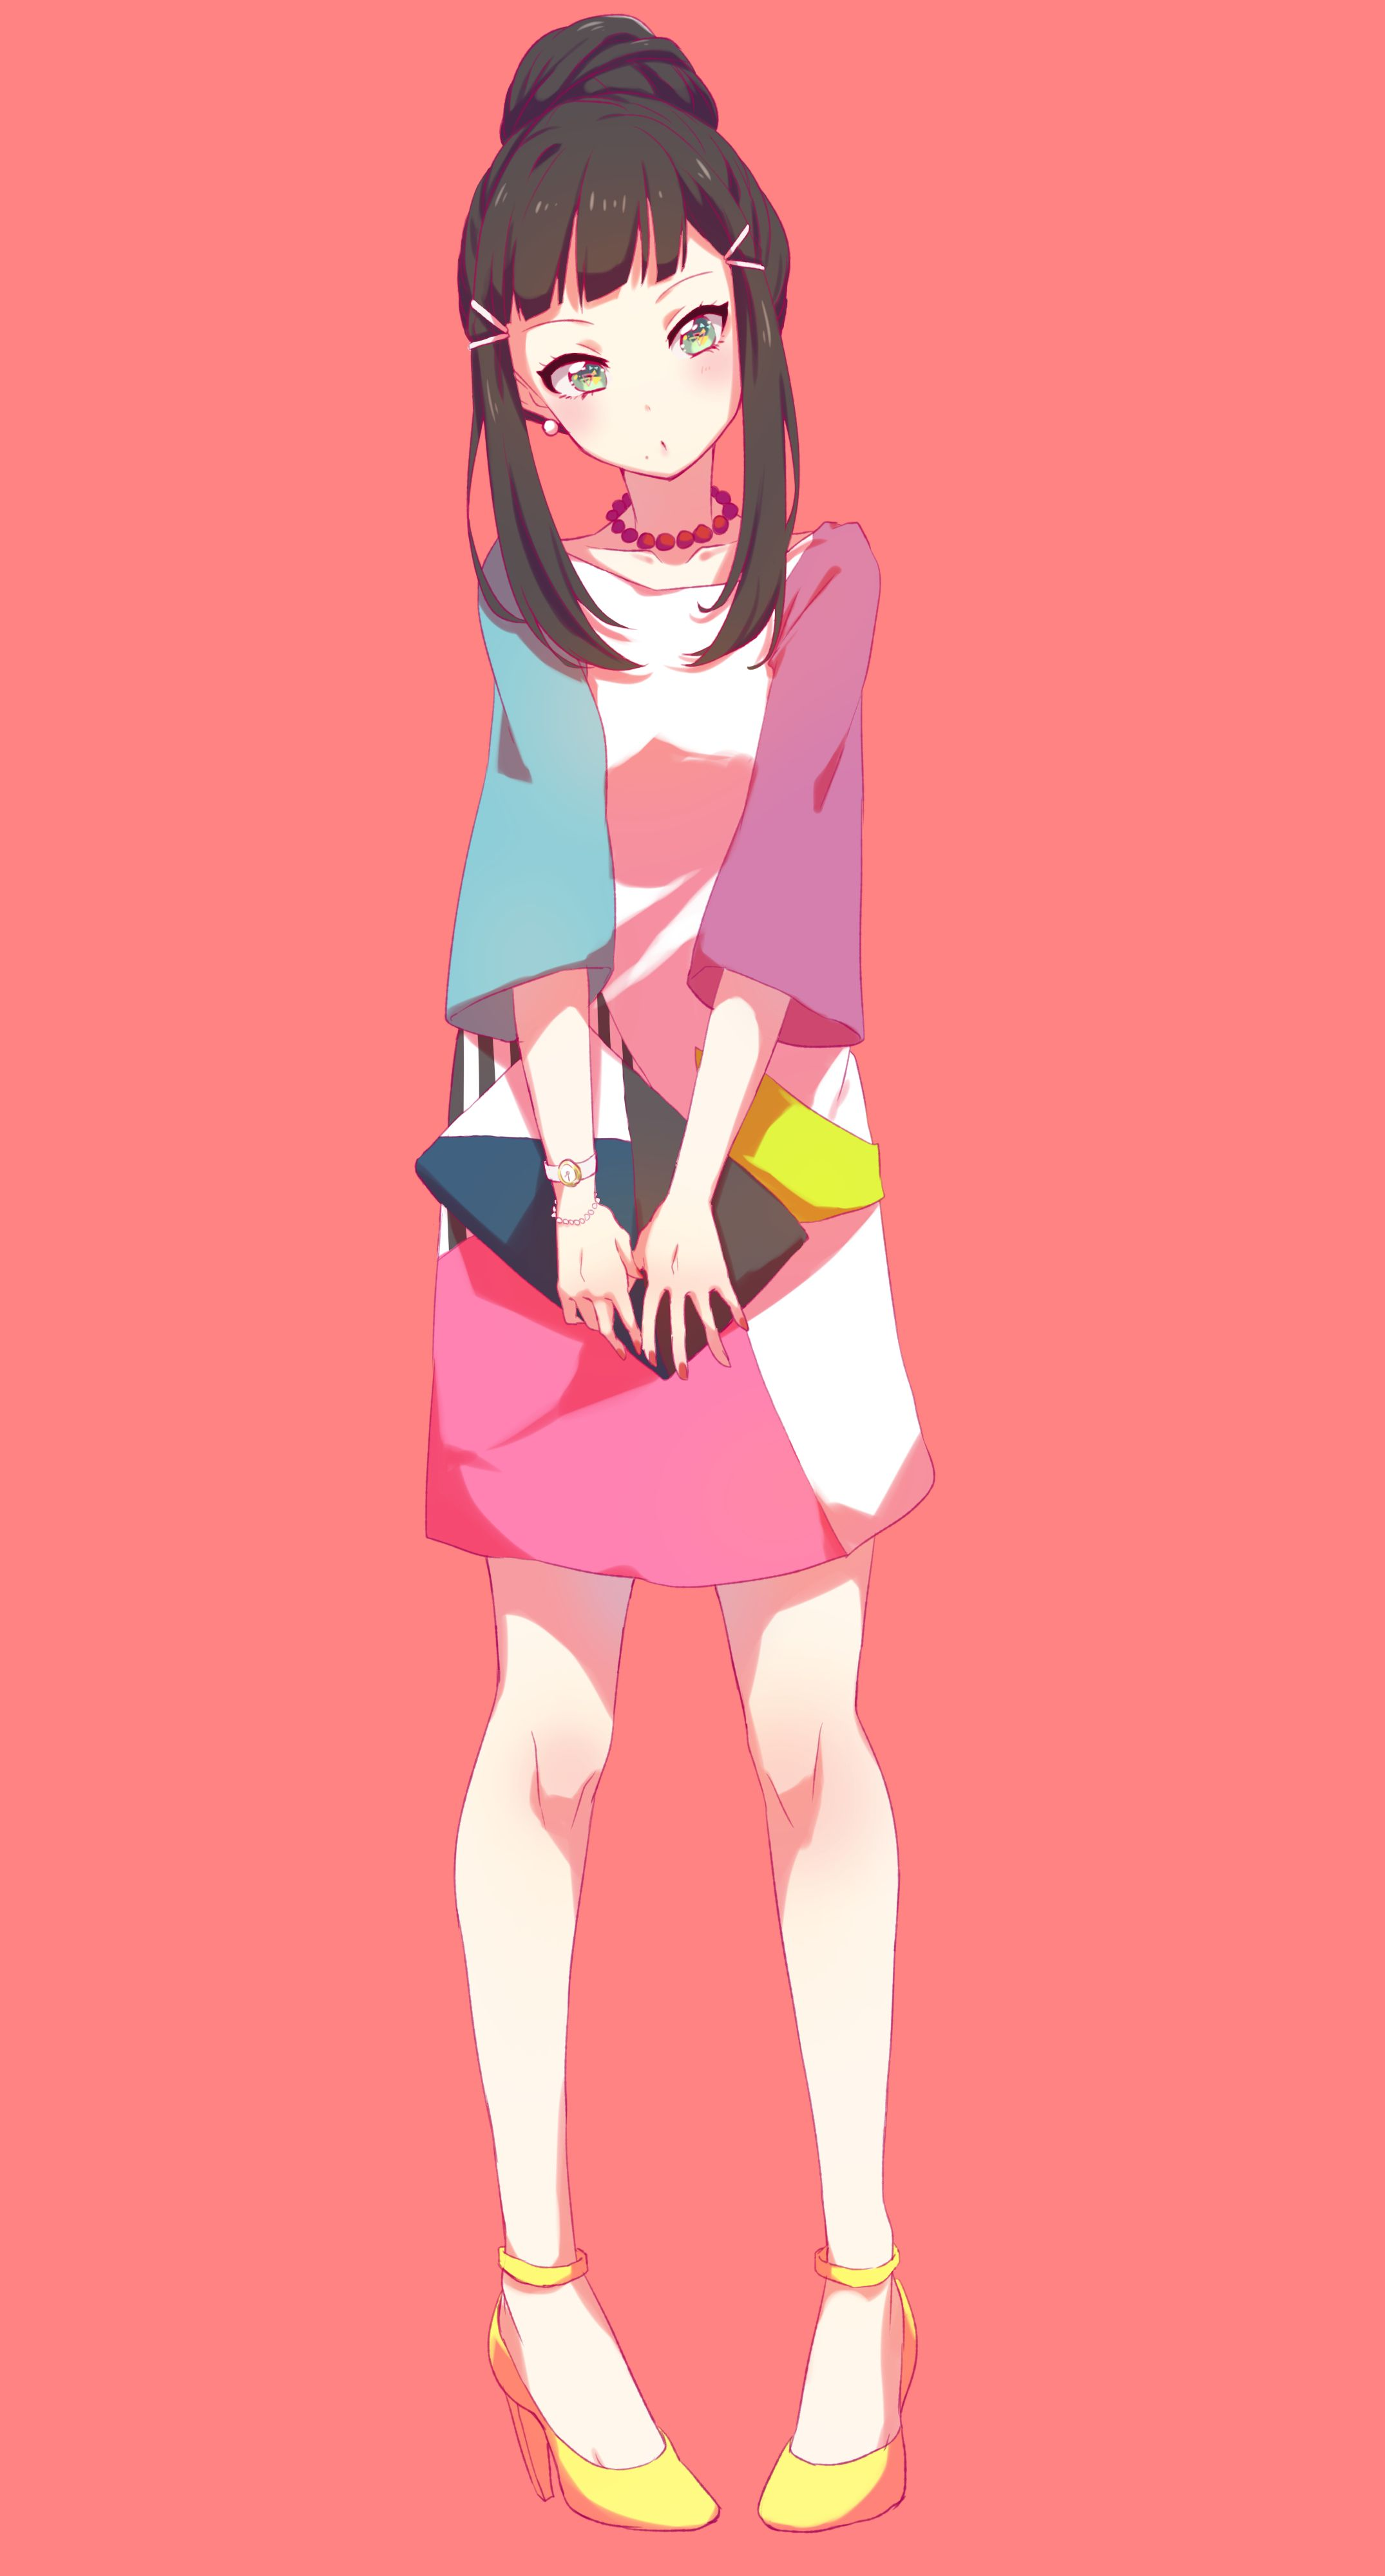 Pinterest(画像あり) アニメの女の子